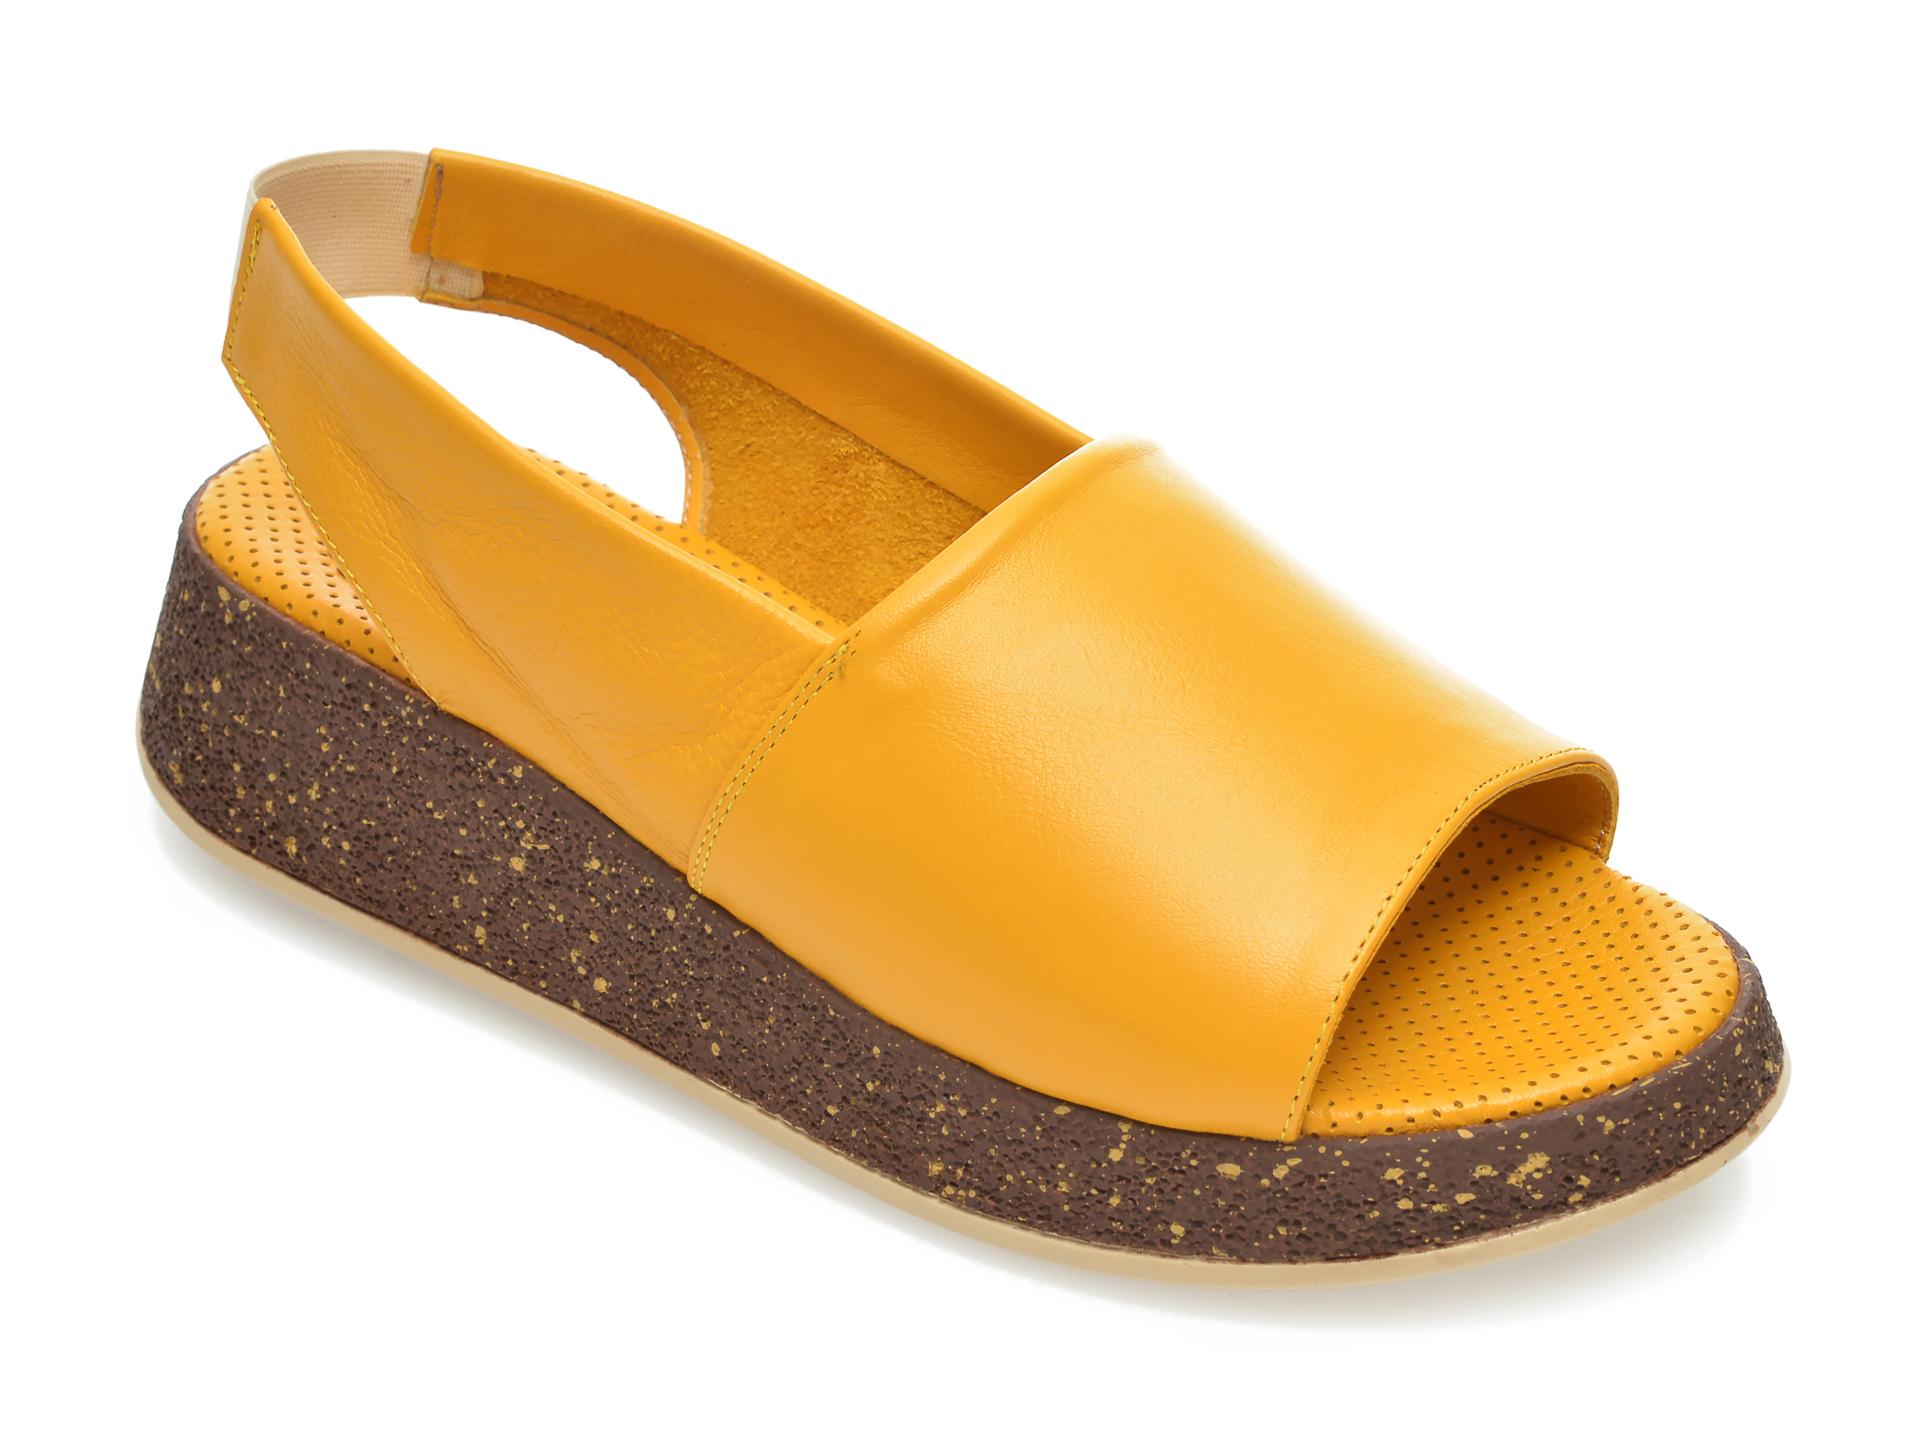 Sandale FLAVIA PASSINI galbene, 2103157, din piele naturala imagine otter.ro 2021